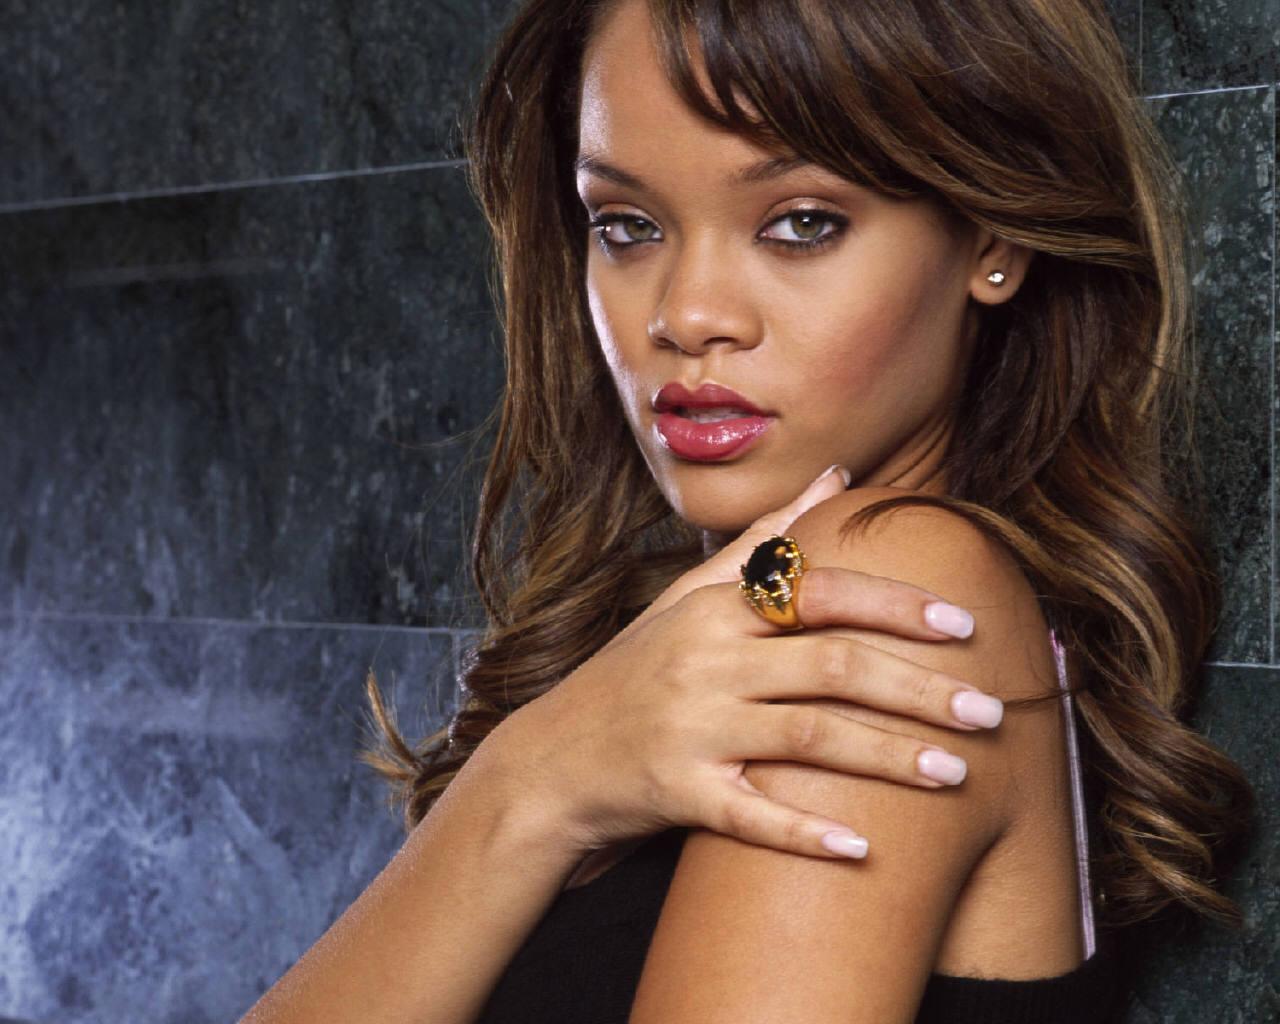 Rihanna - Rihanna Wallpaper (166369) - Fanpop Rihanna